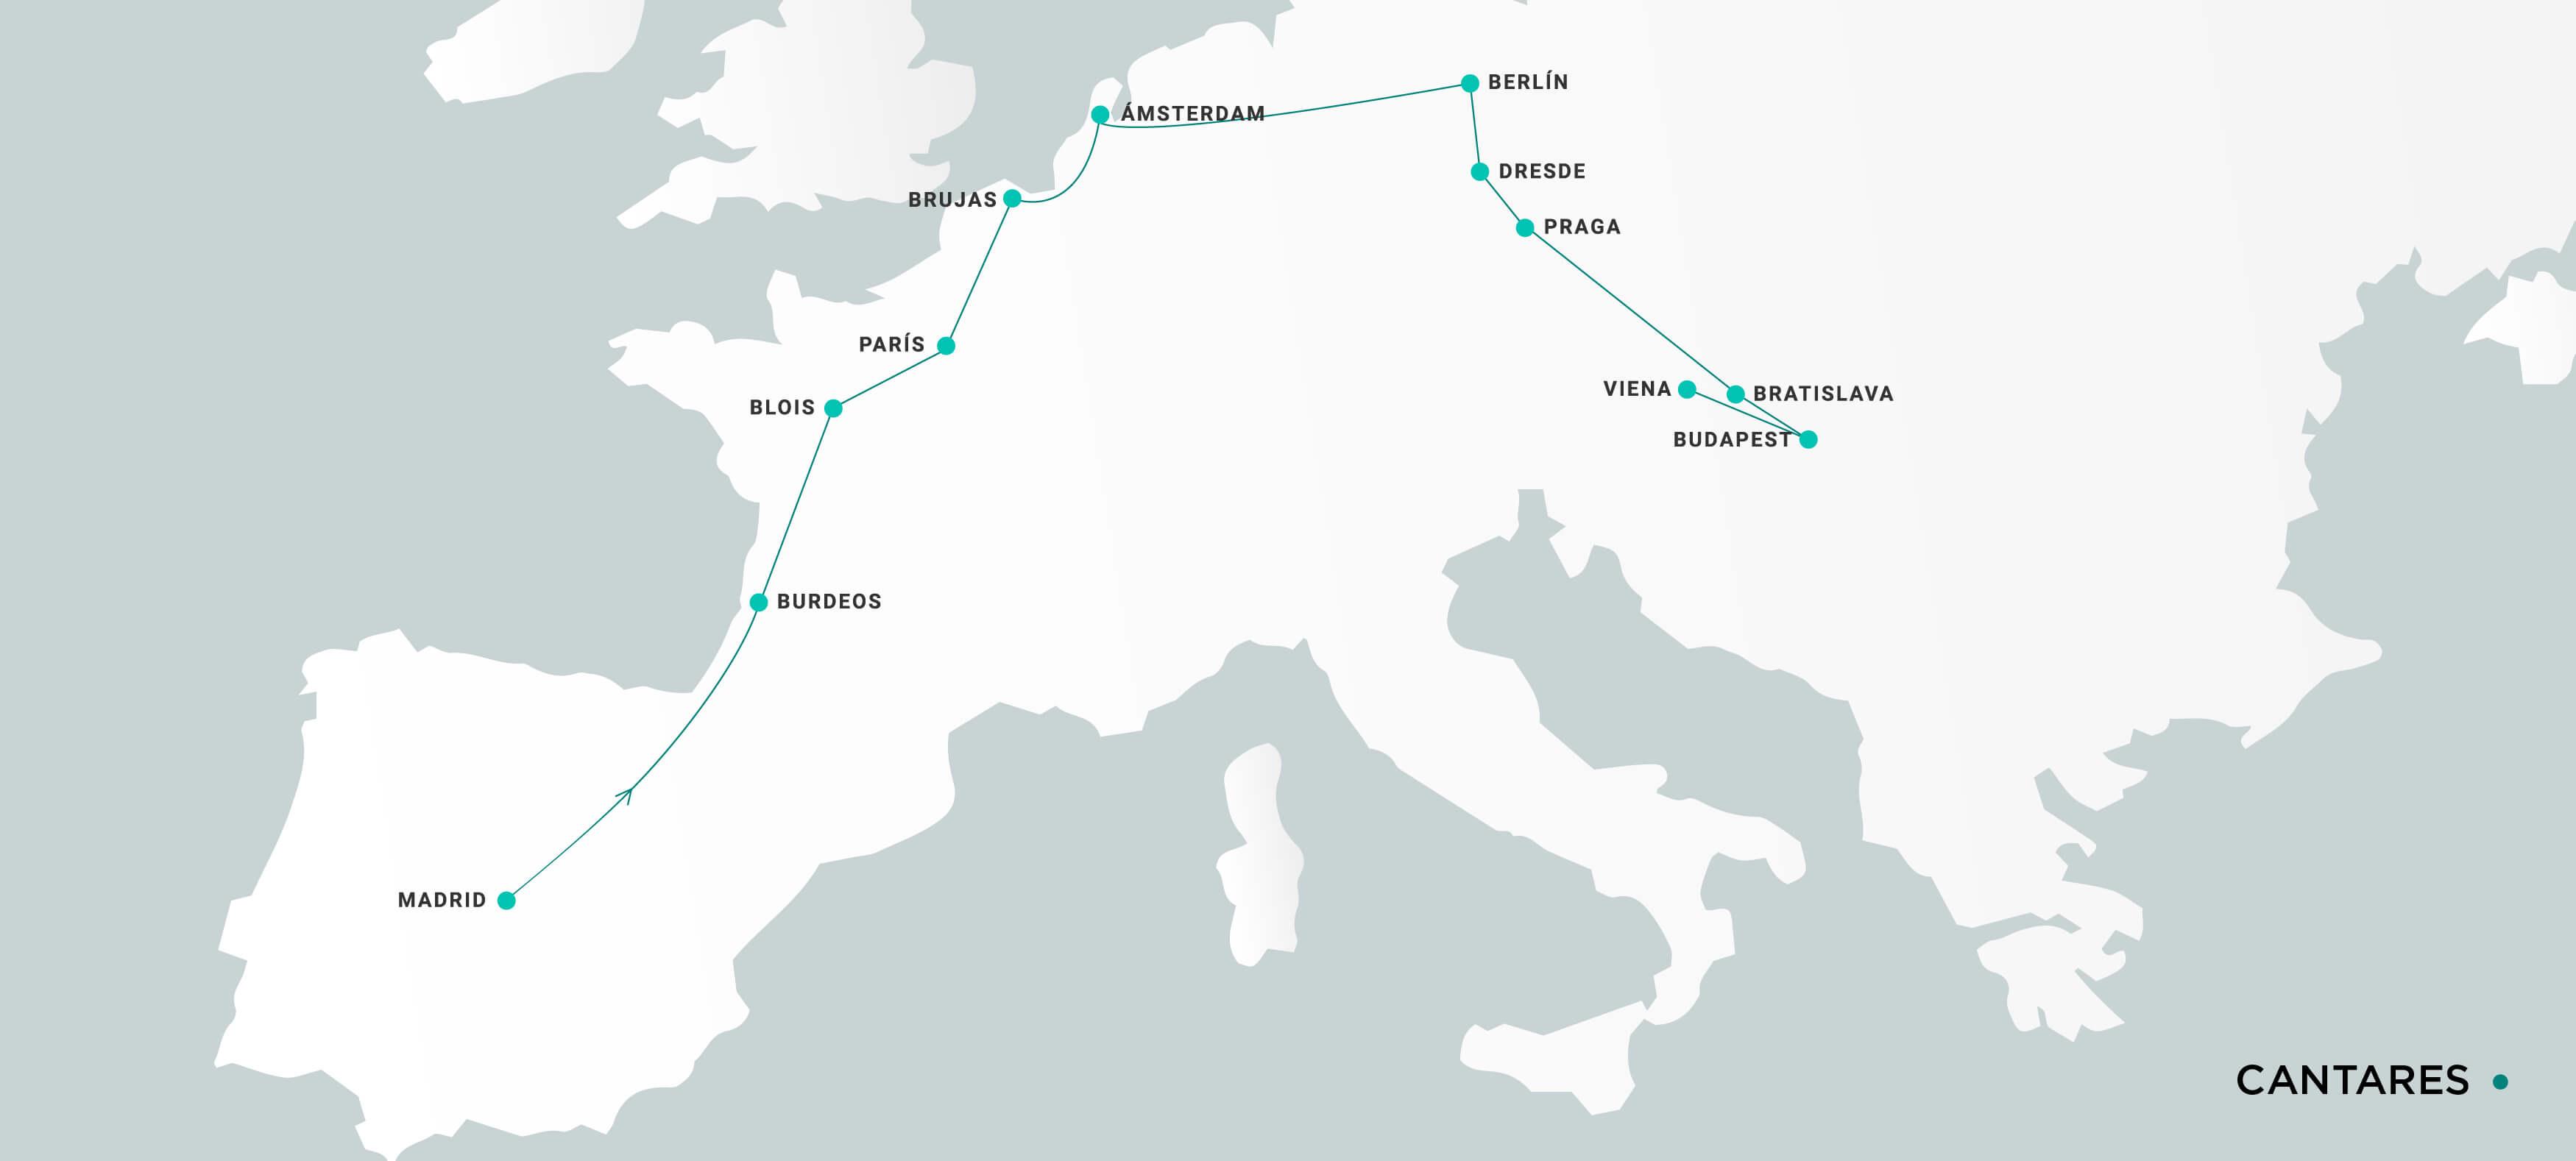 Mapa Cantares